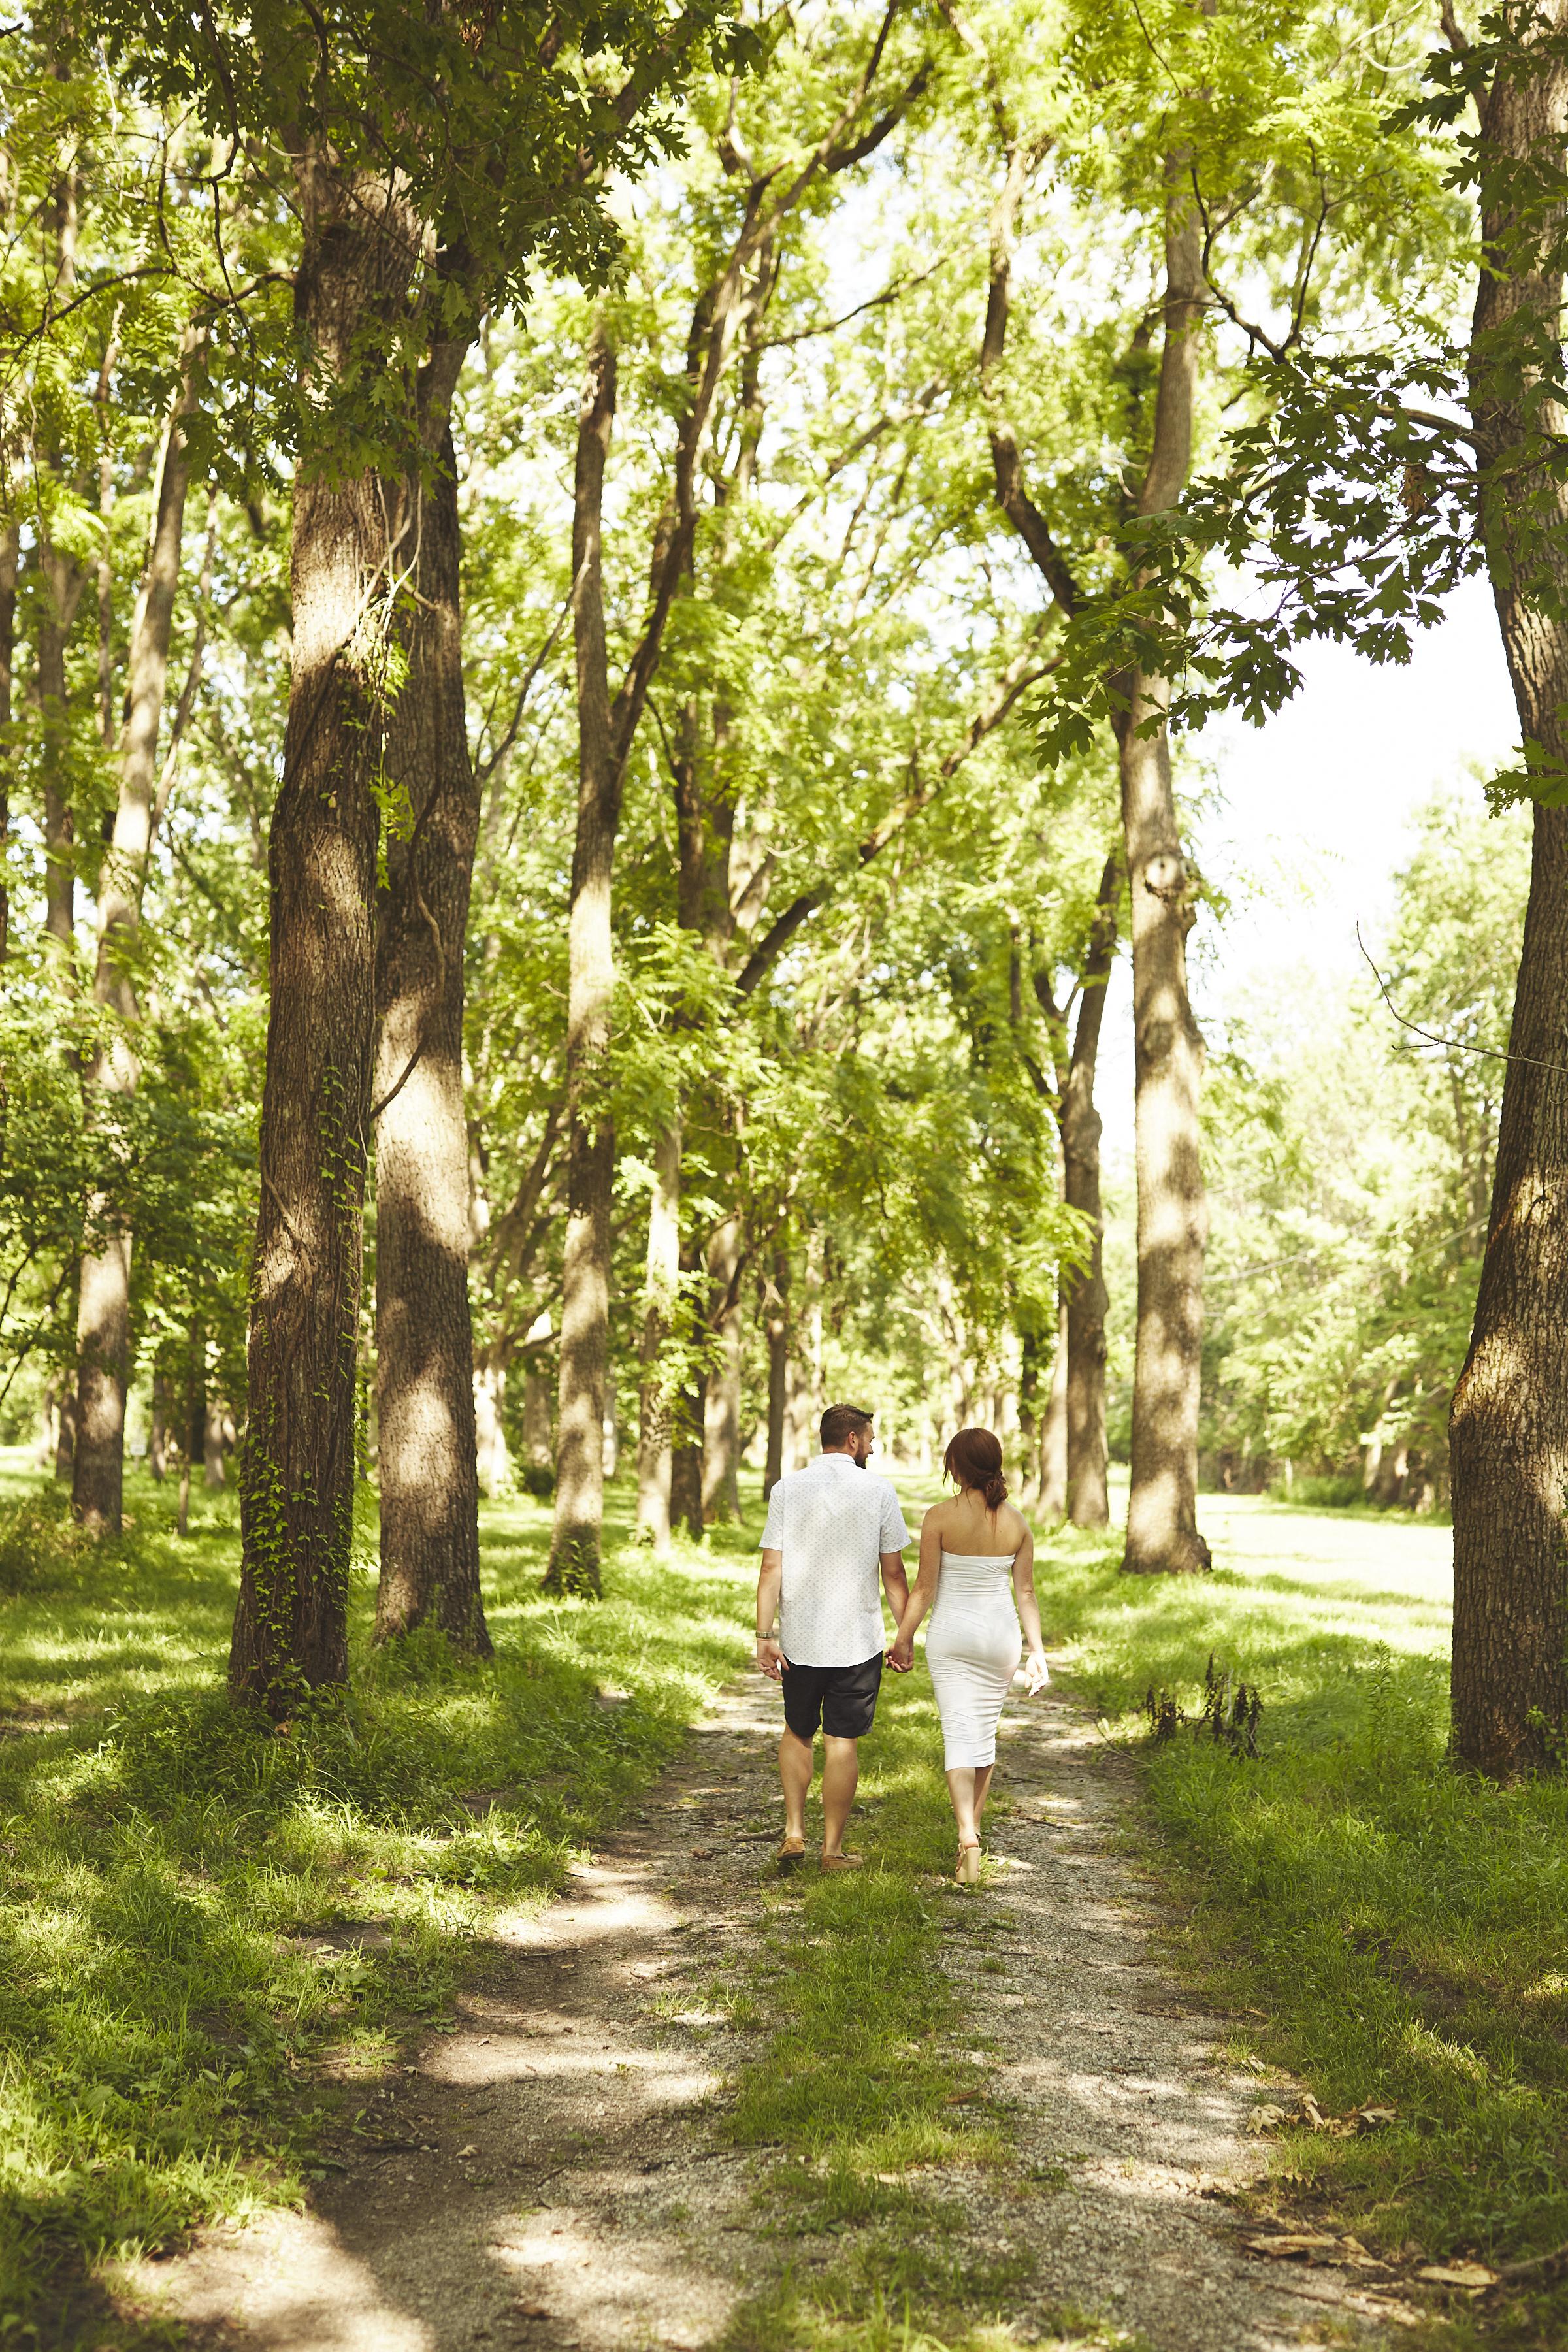 Ashley & David - benromangphoto - 6I5A4821.jpg